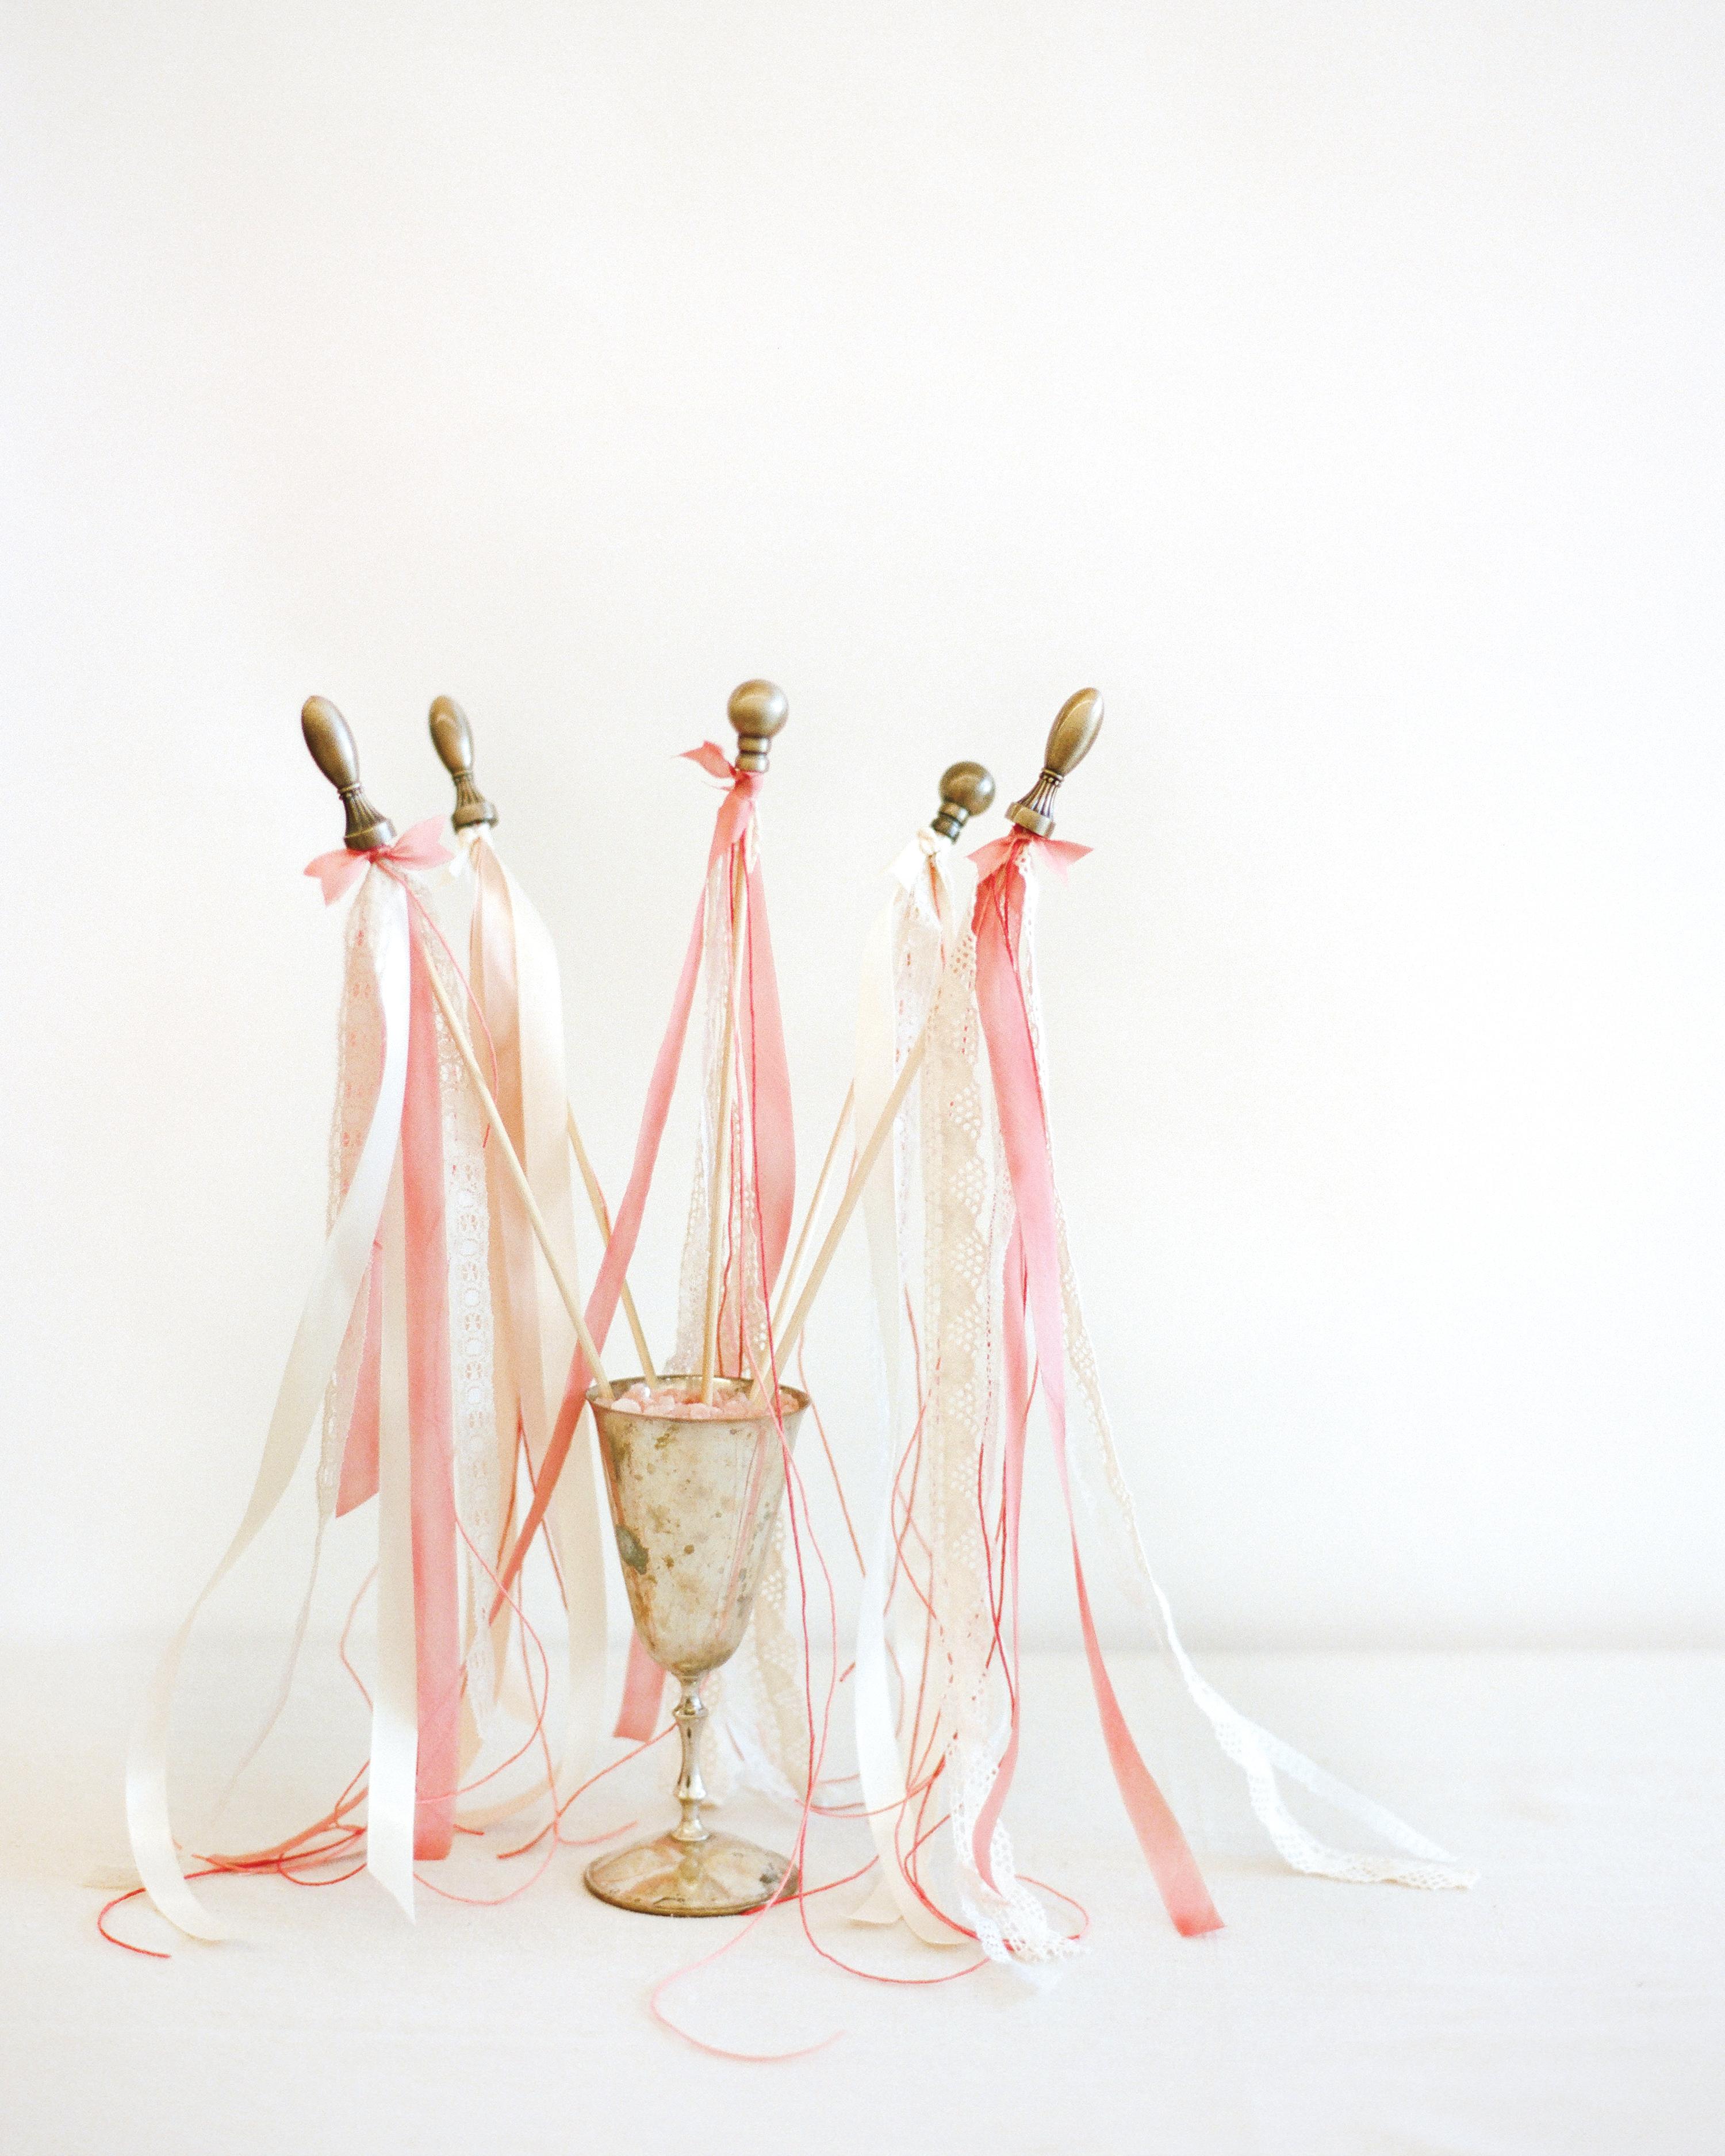 ribbon-wand-elizabeth-messina-004-mwds110806.jpg